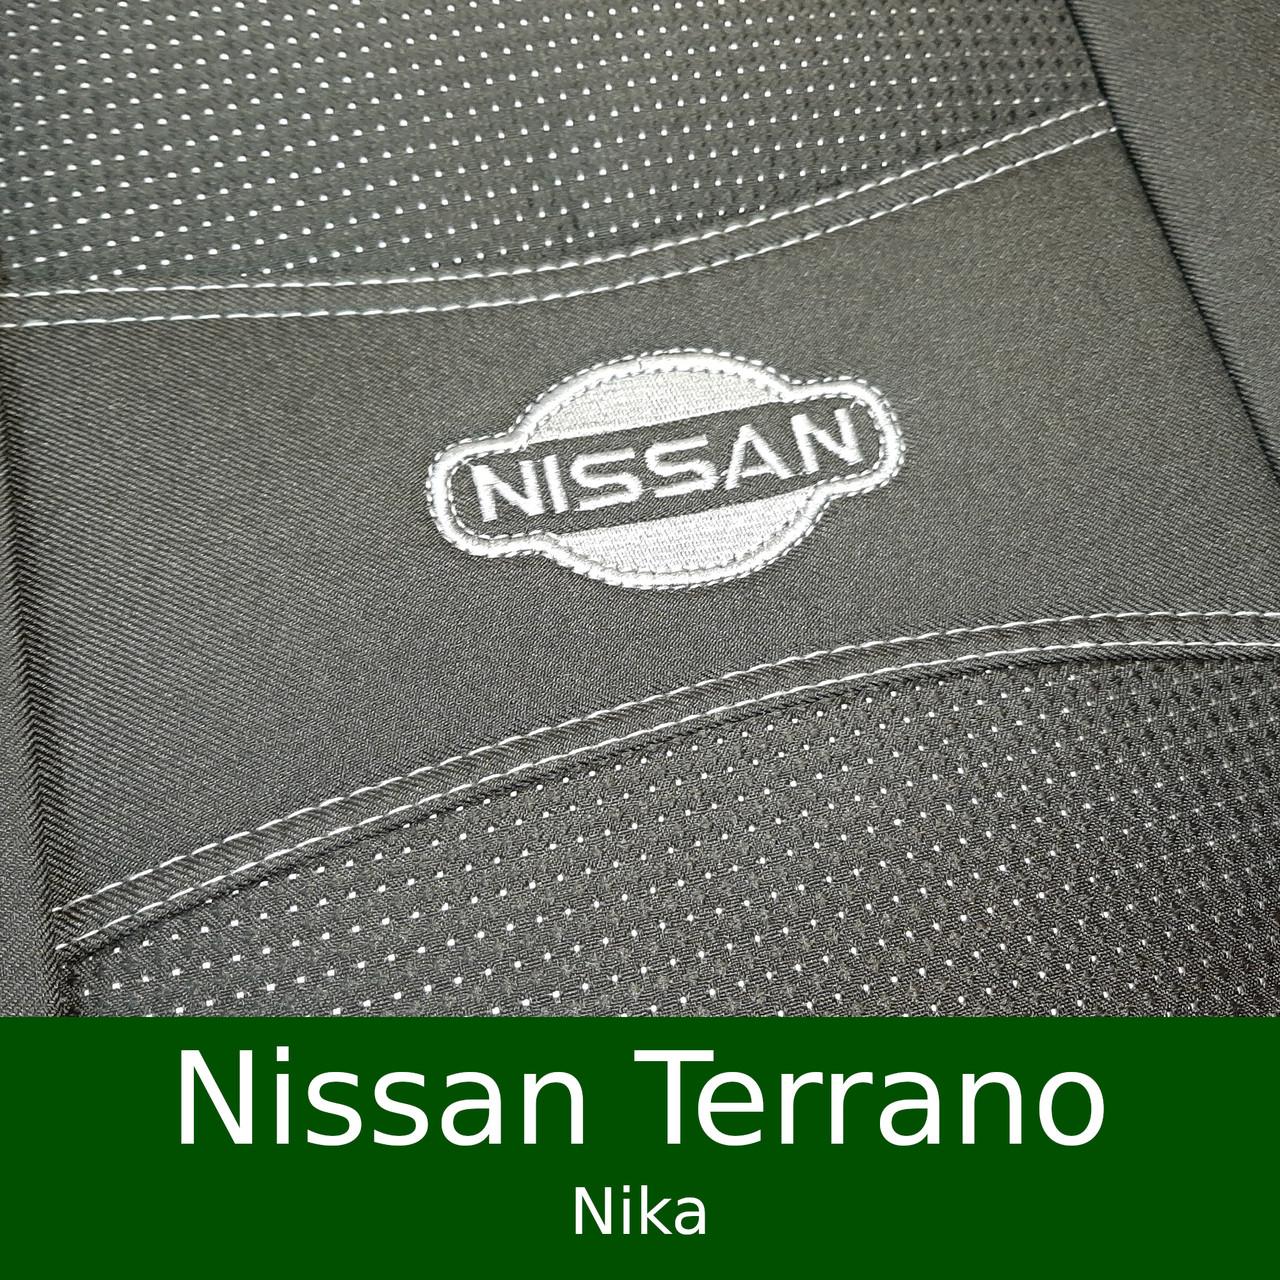 Чехлы на сиденья Nissan Terrano 2014-2017 (Nika)